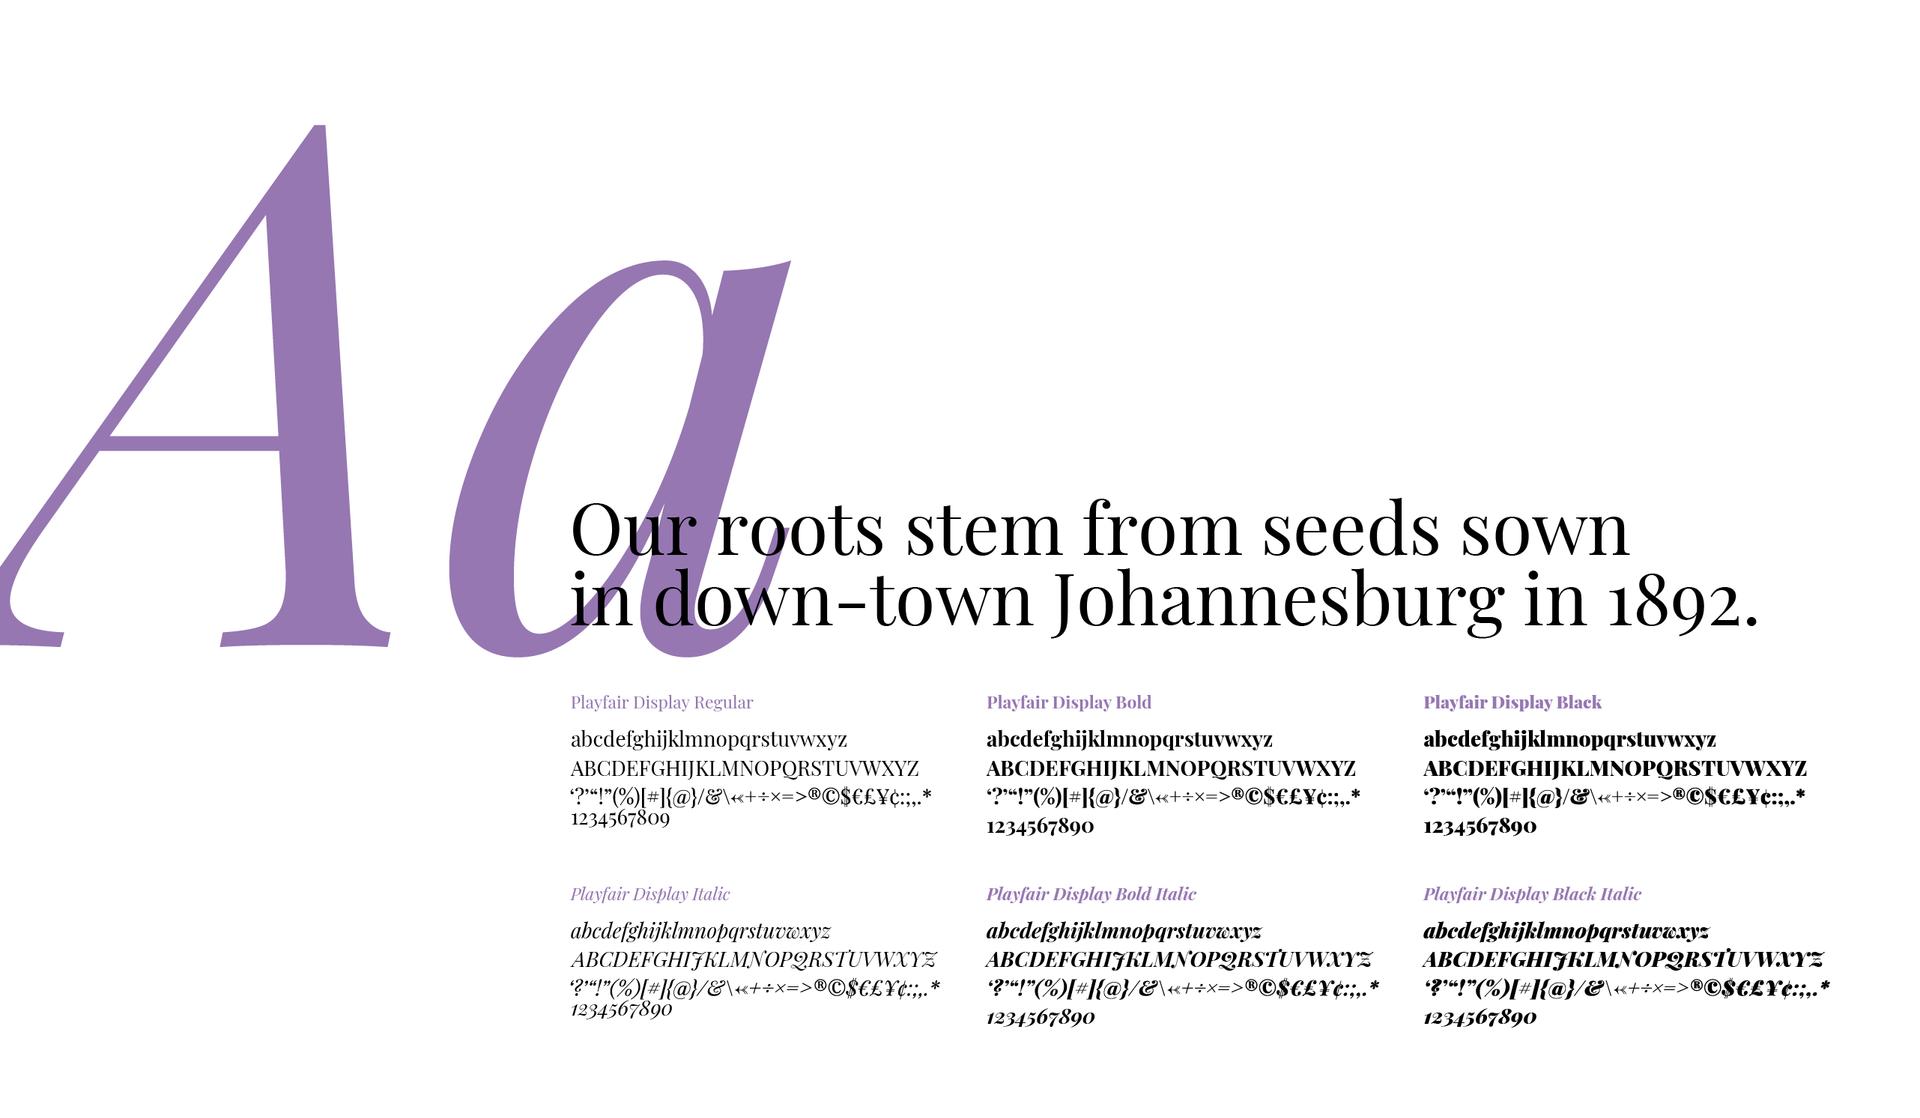 3-Law-Firm-Brand-Design-Serif-Typography